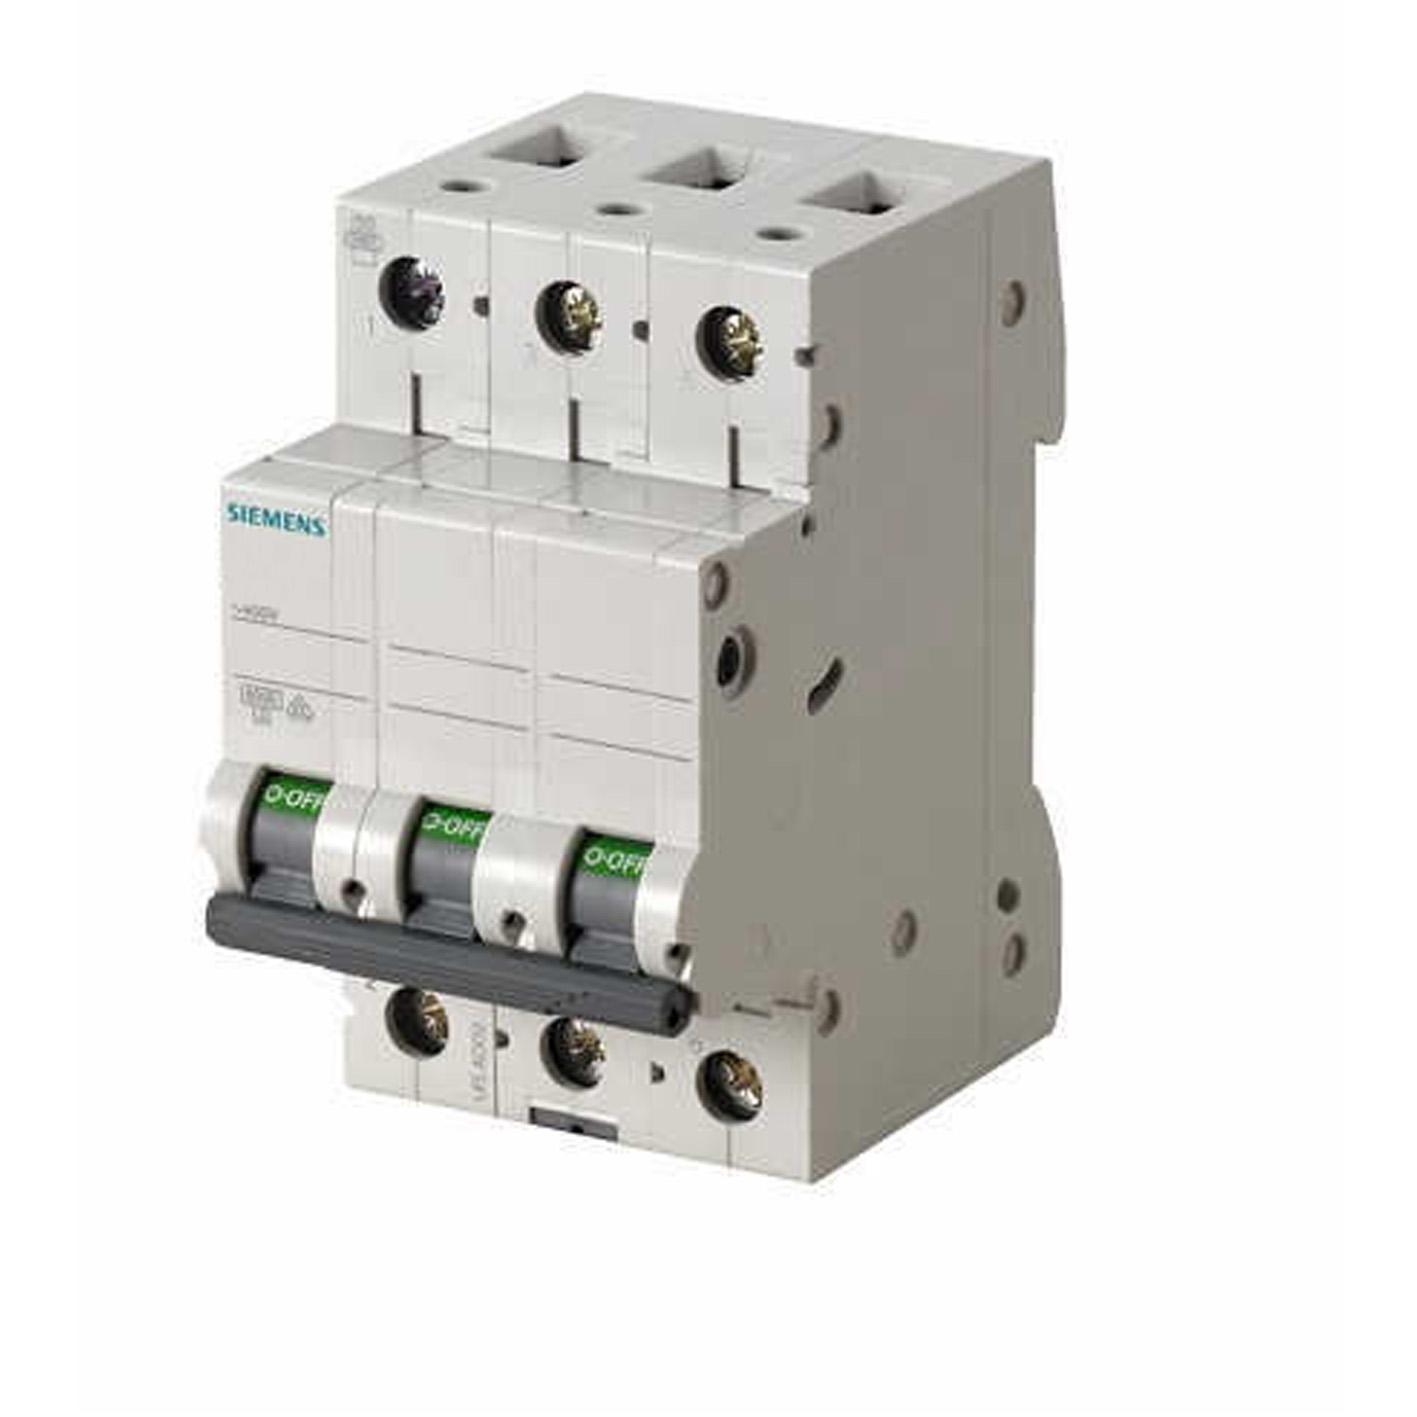 Siemens 3X25A Otomatik Sigorta